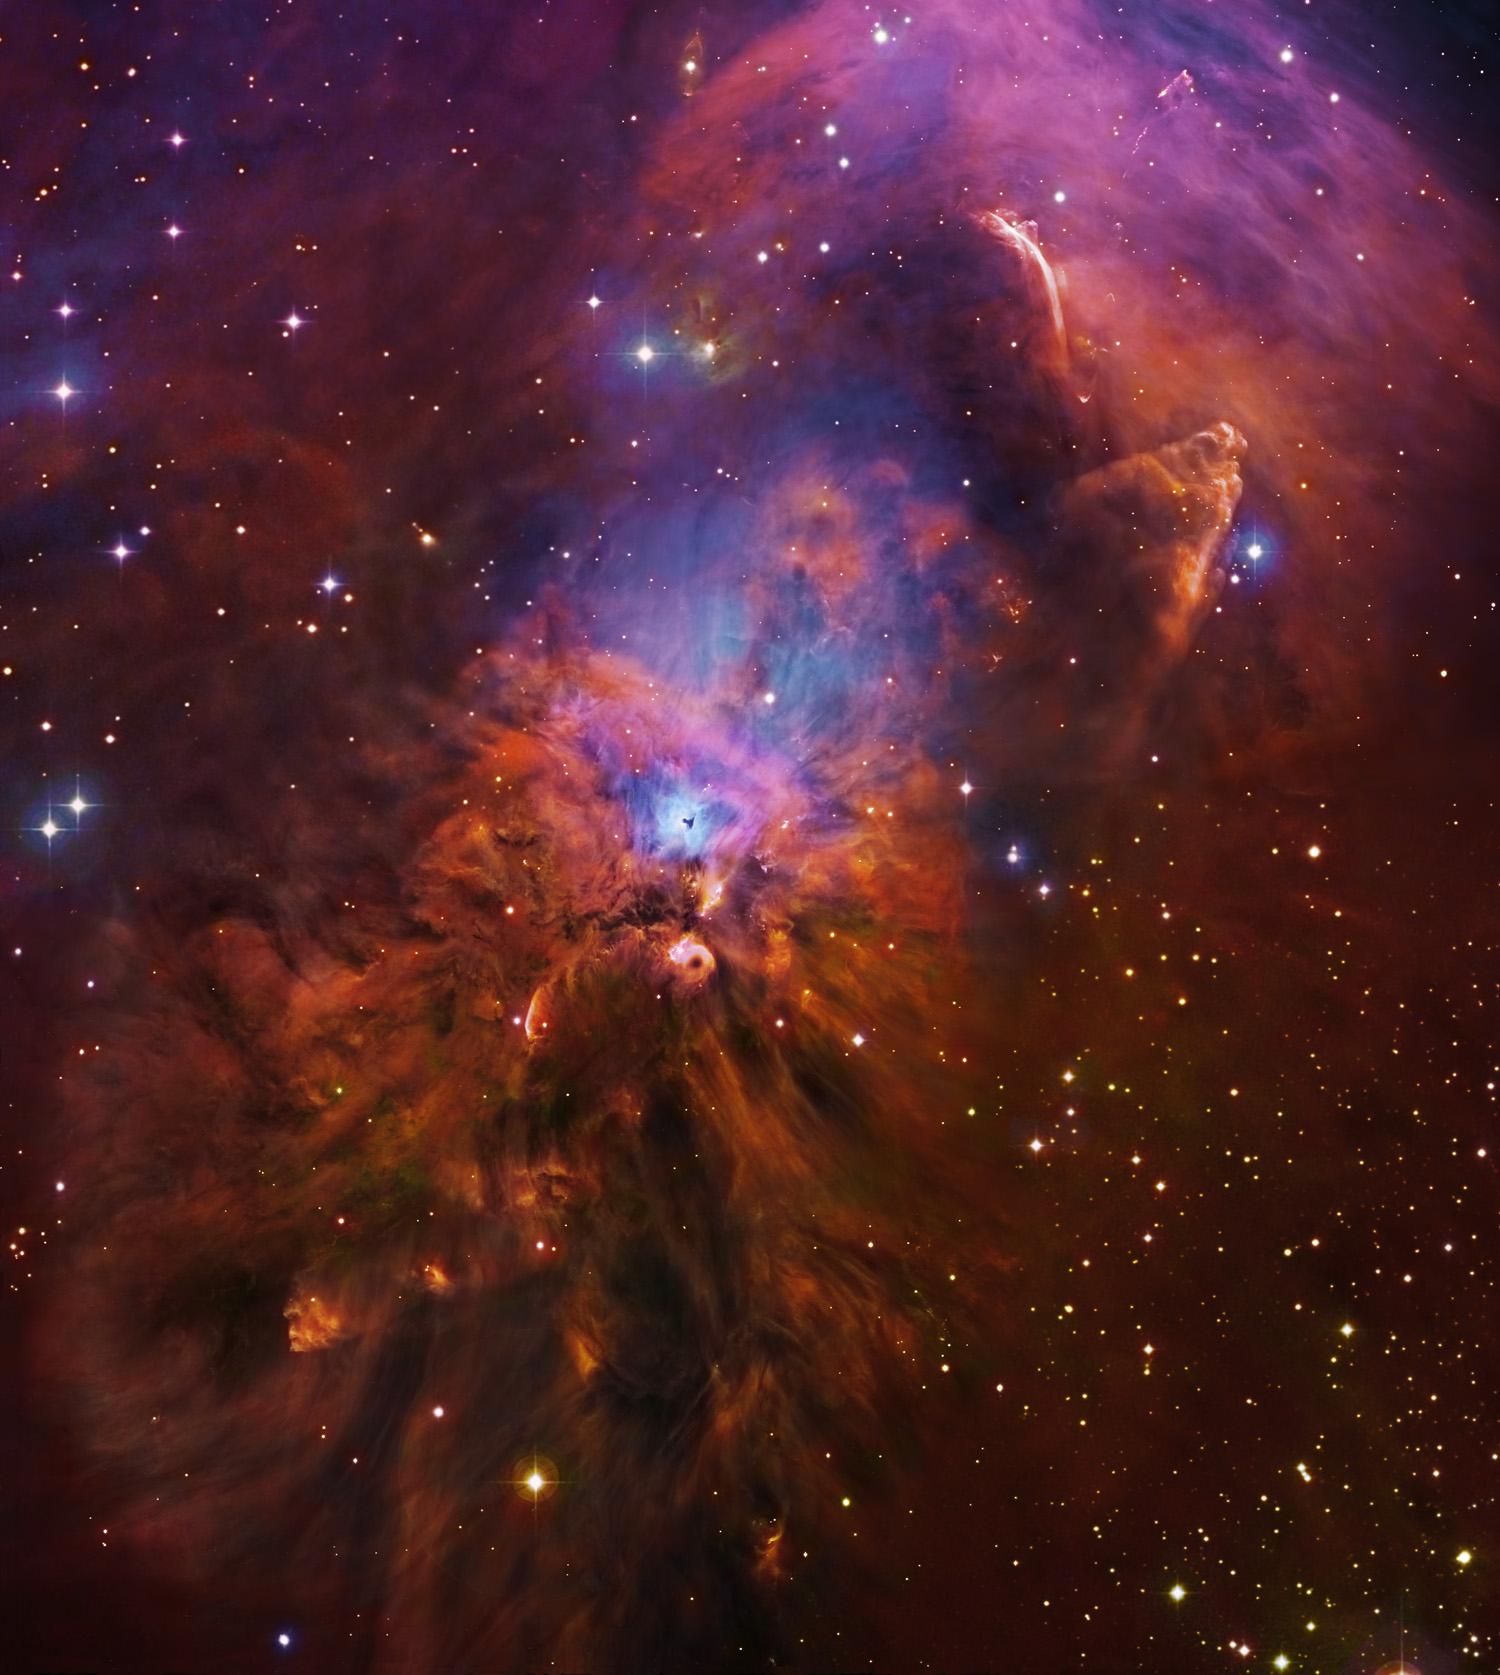 NGC1999-Subaru-HST-DSS-M robert gendler fstoppers photography stars gallaxy astronomy